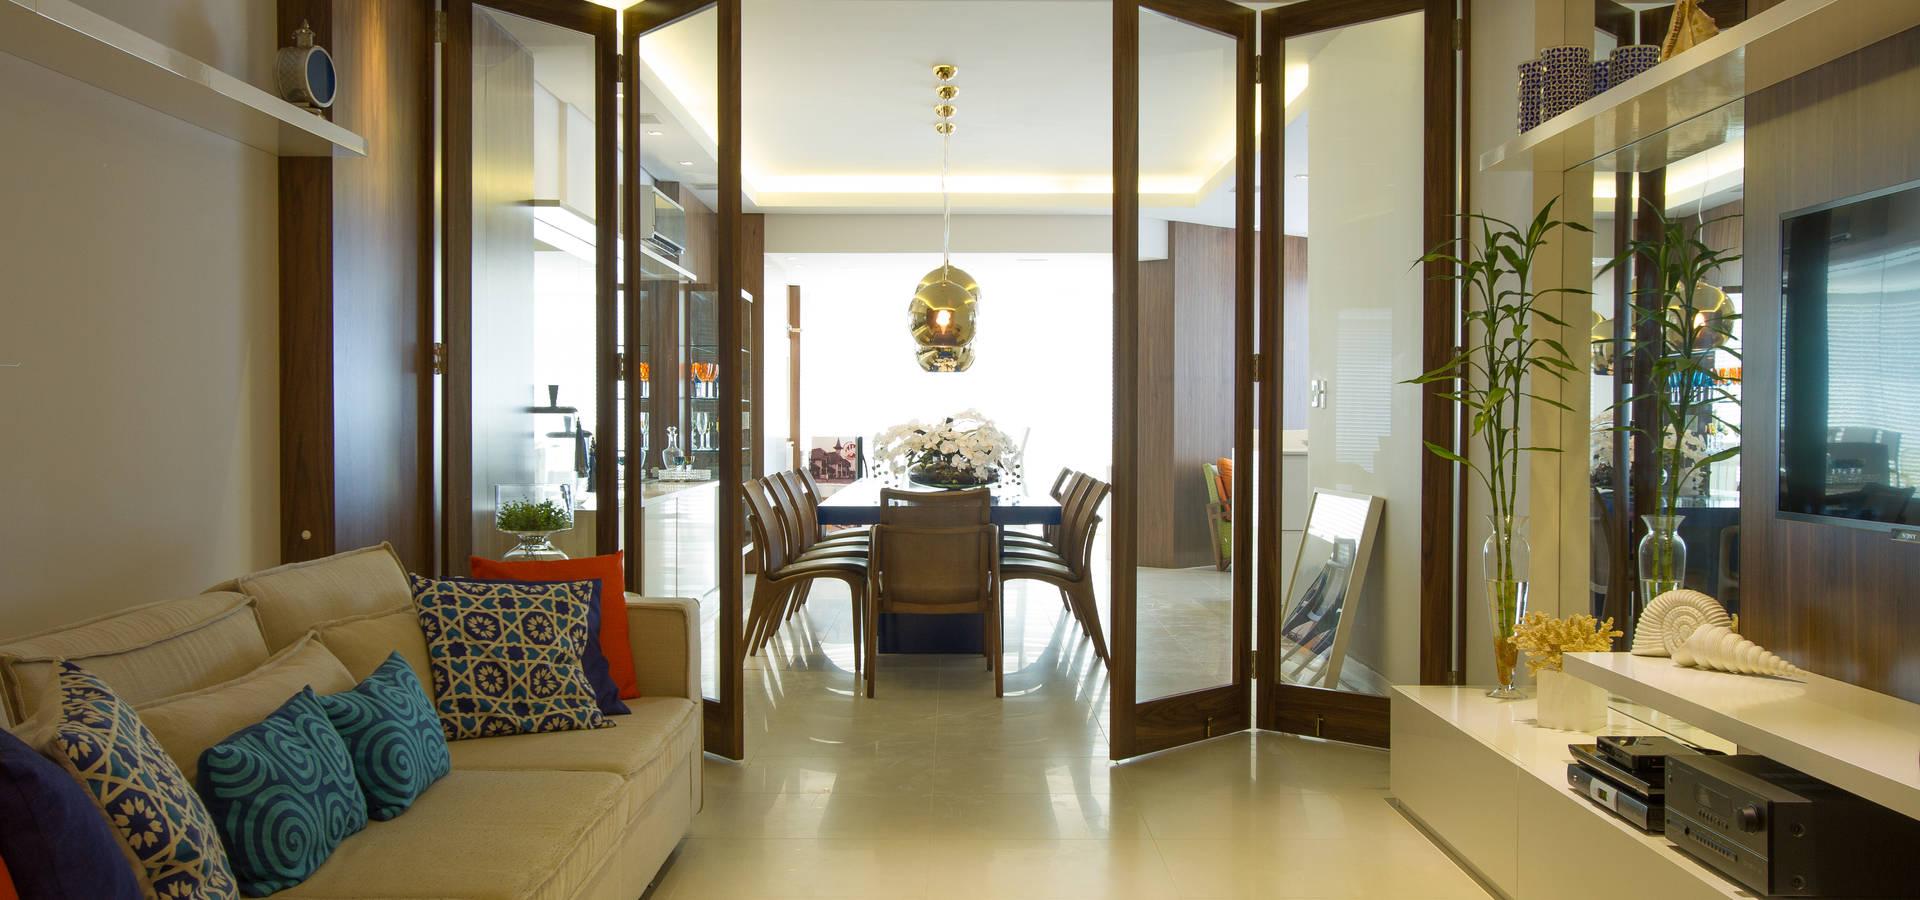 Sieli Haynosz / Arquitetura + Interiores